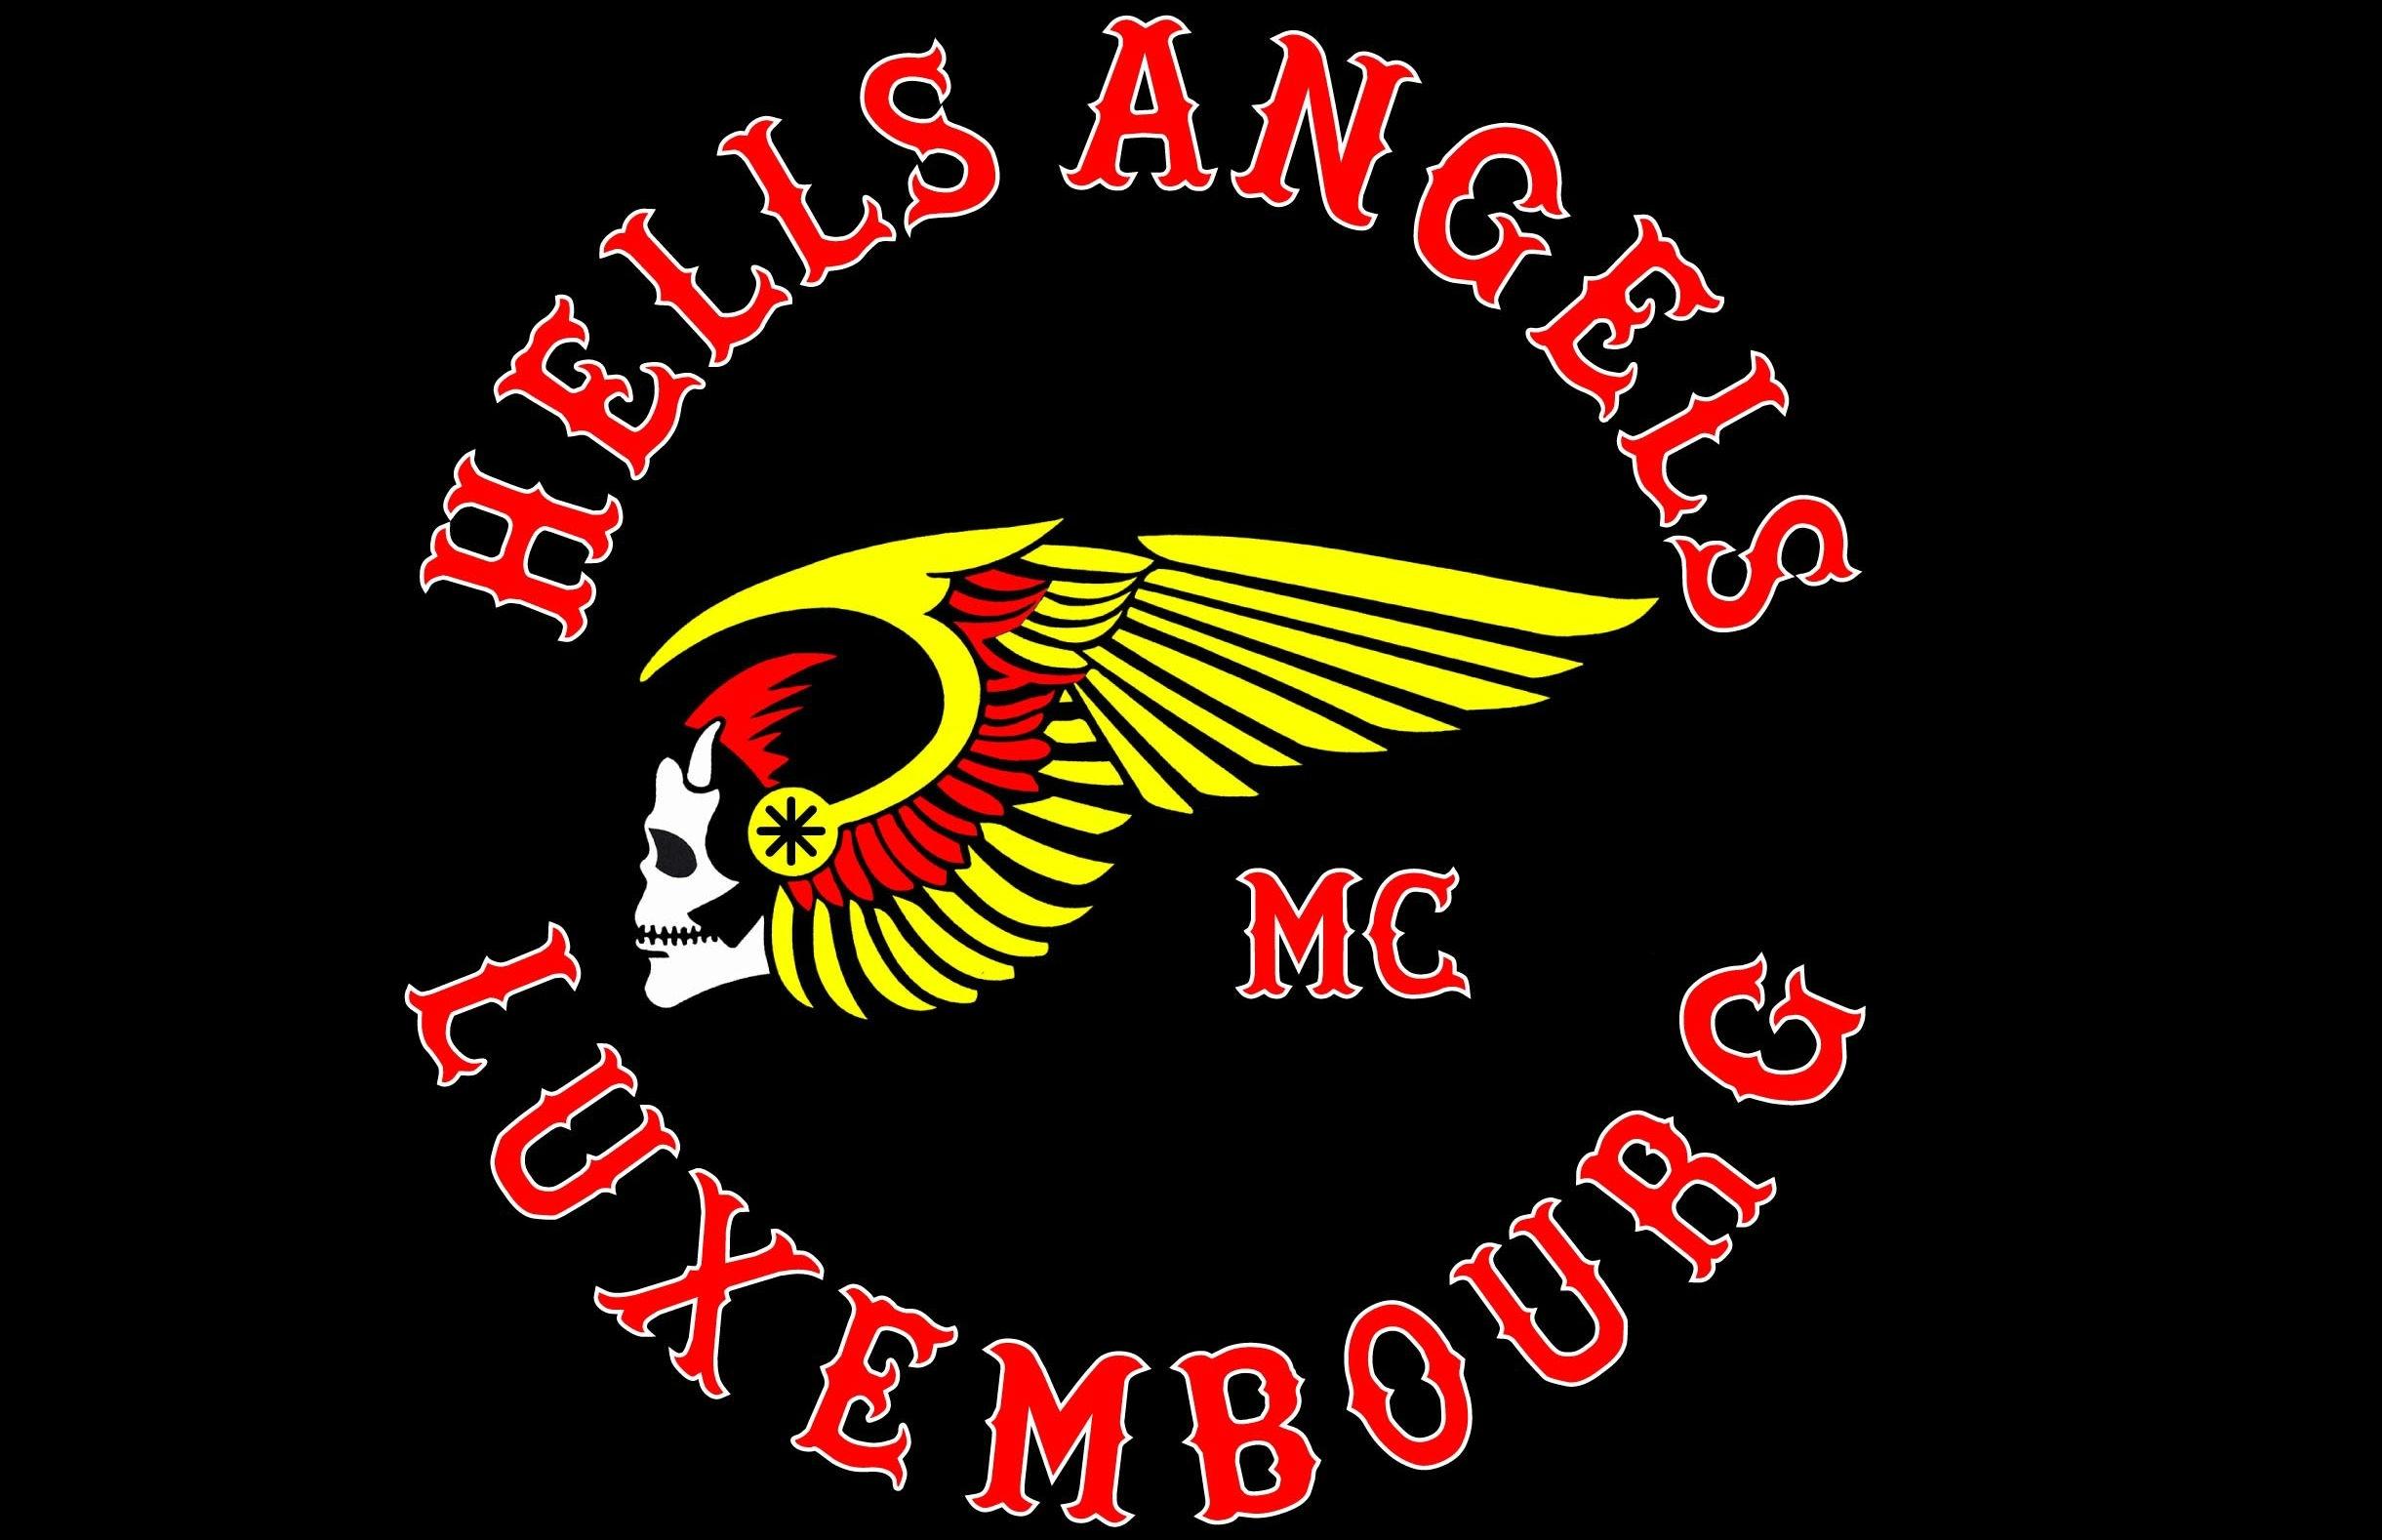 20 hells angels fonds d'écran hd | arrière-plans - wallpaper abyss